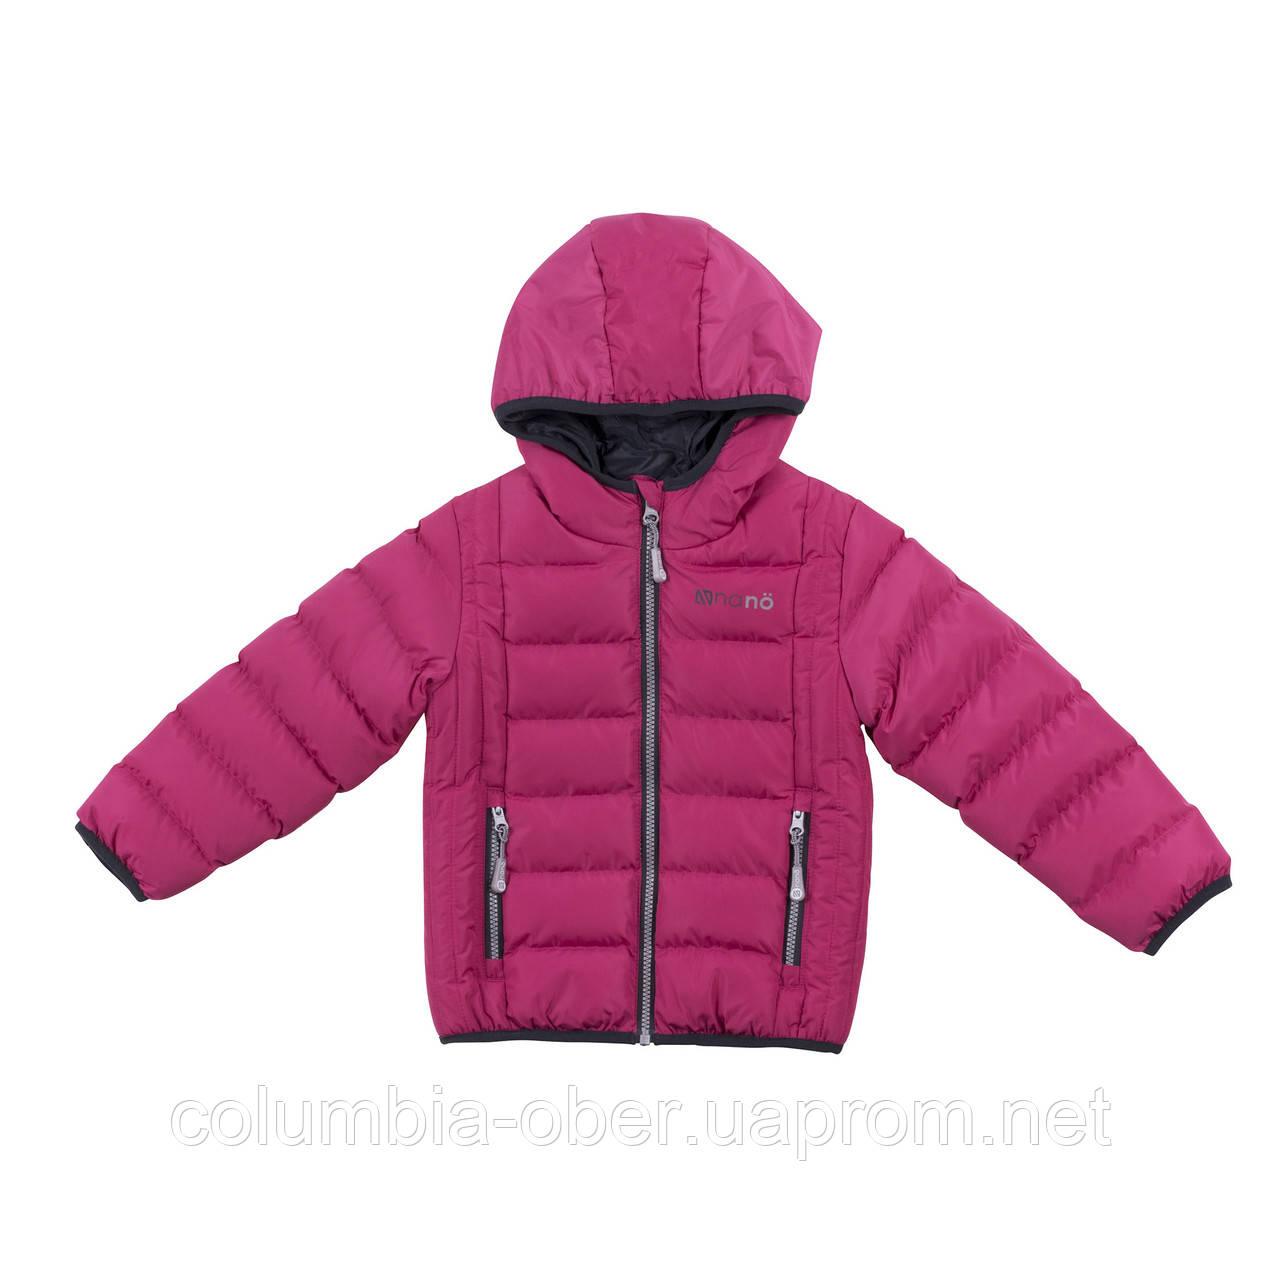 Демисезонная куртка для девочки NANO F18 M 1250 Candy Berries. Размер 2-14.